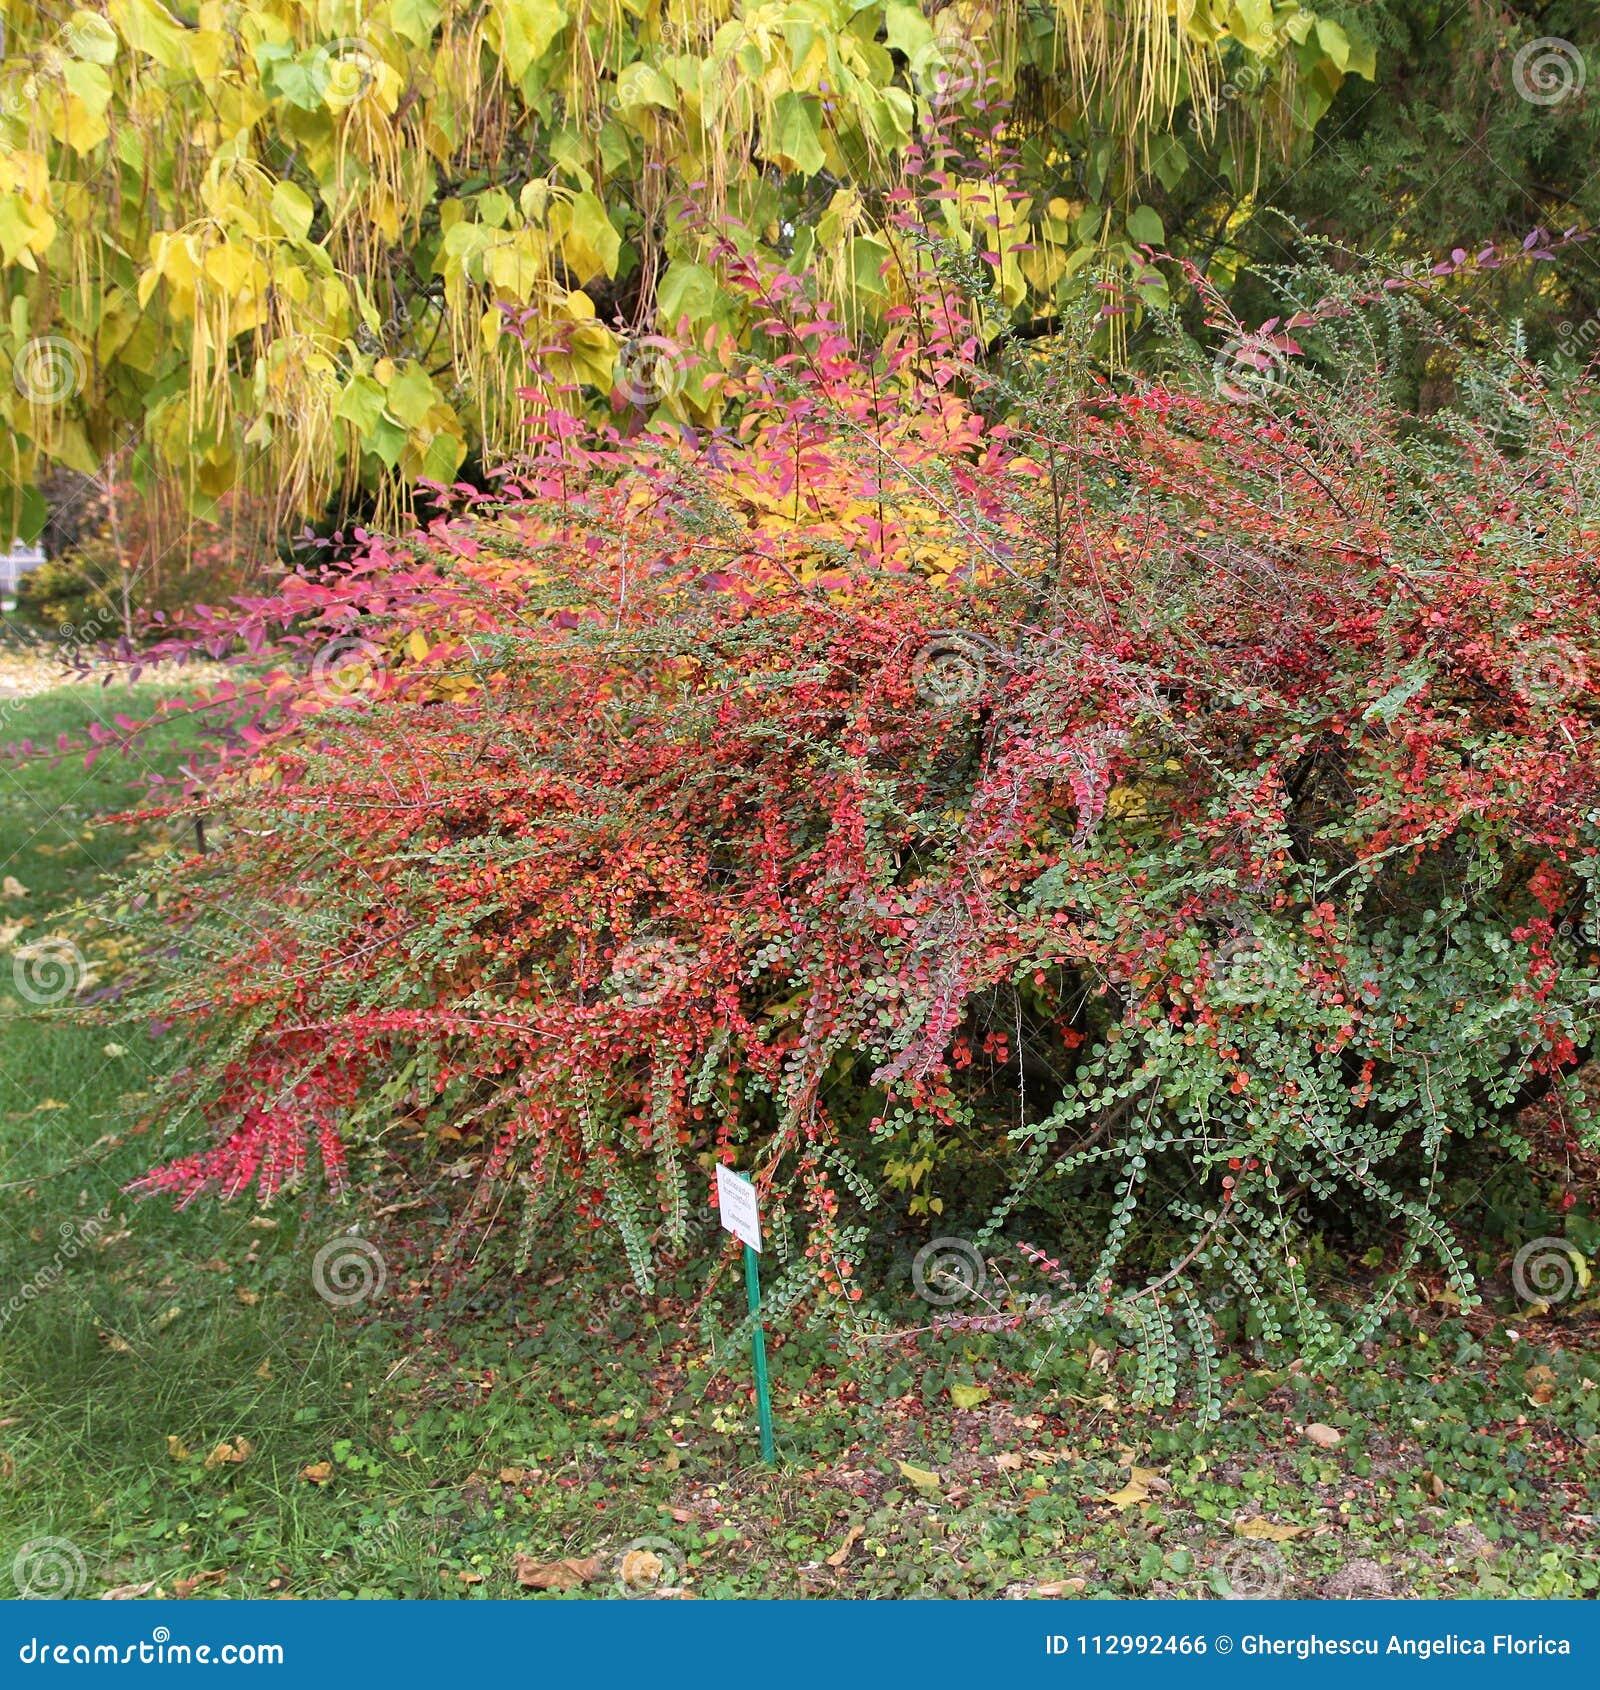 Bushes at the botanical garden. Colorful Cotoneaster horizontalis